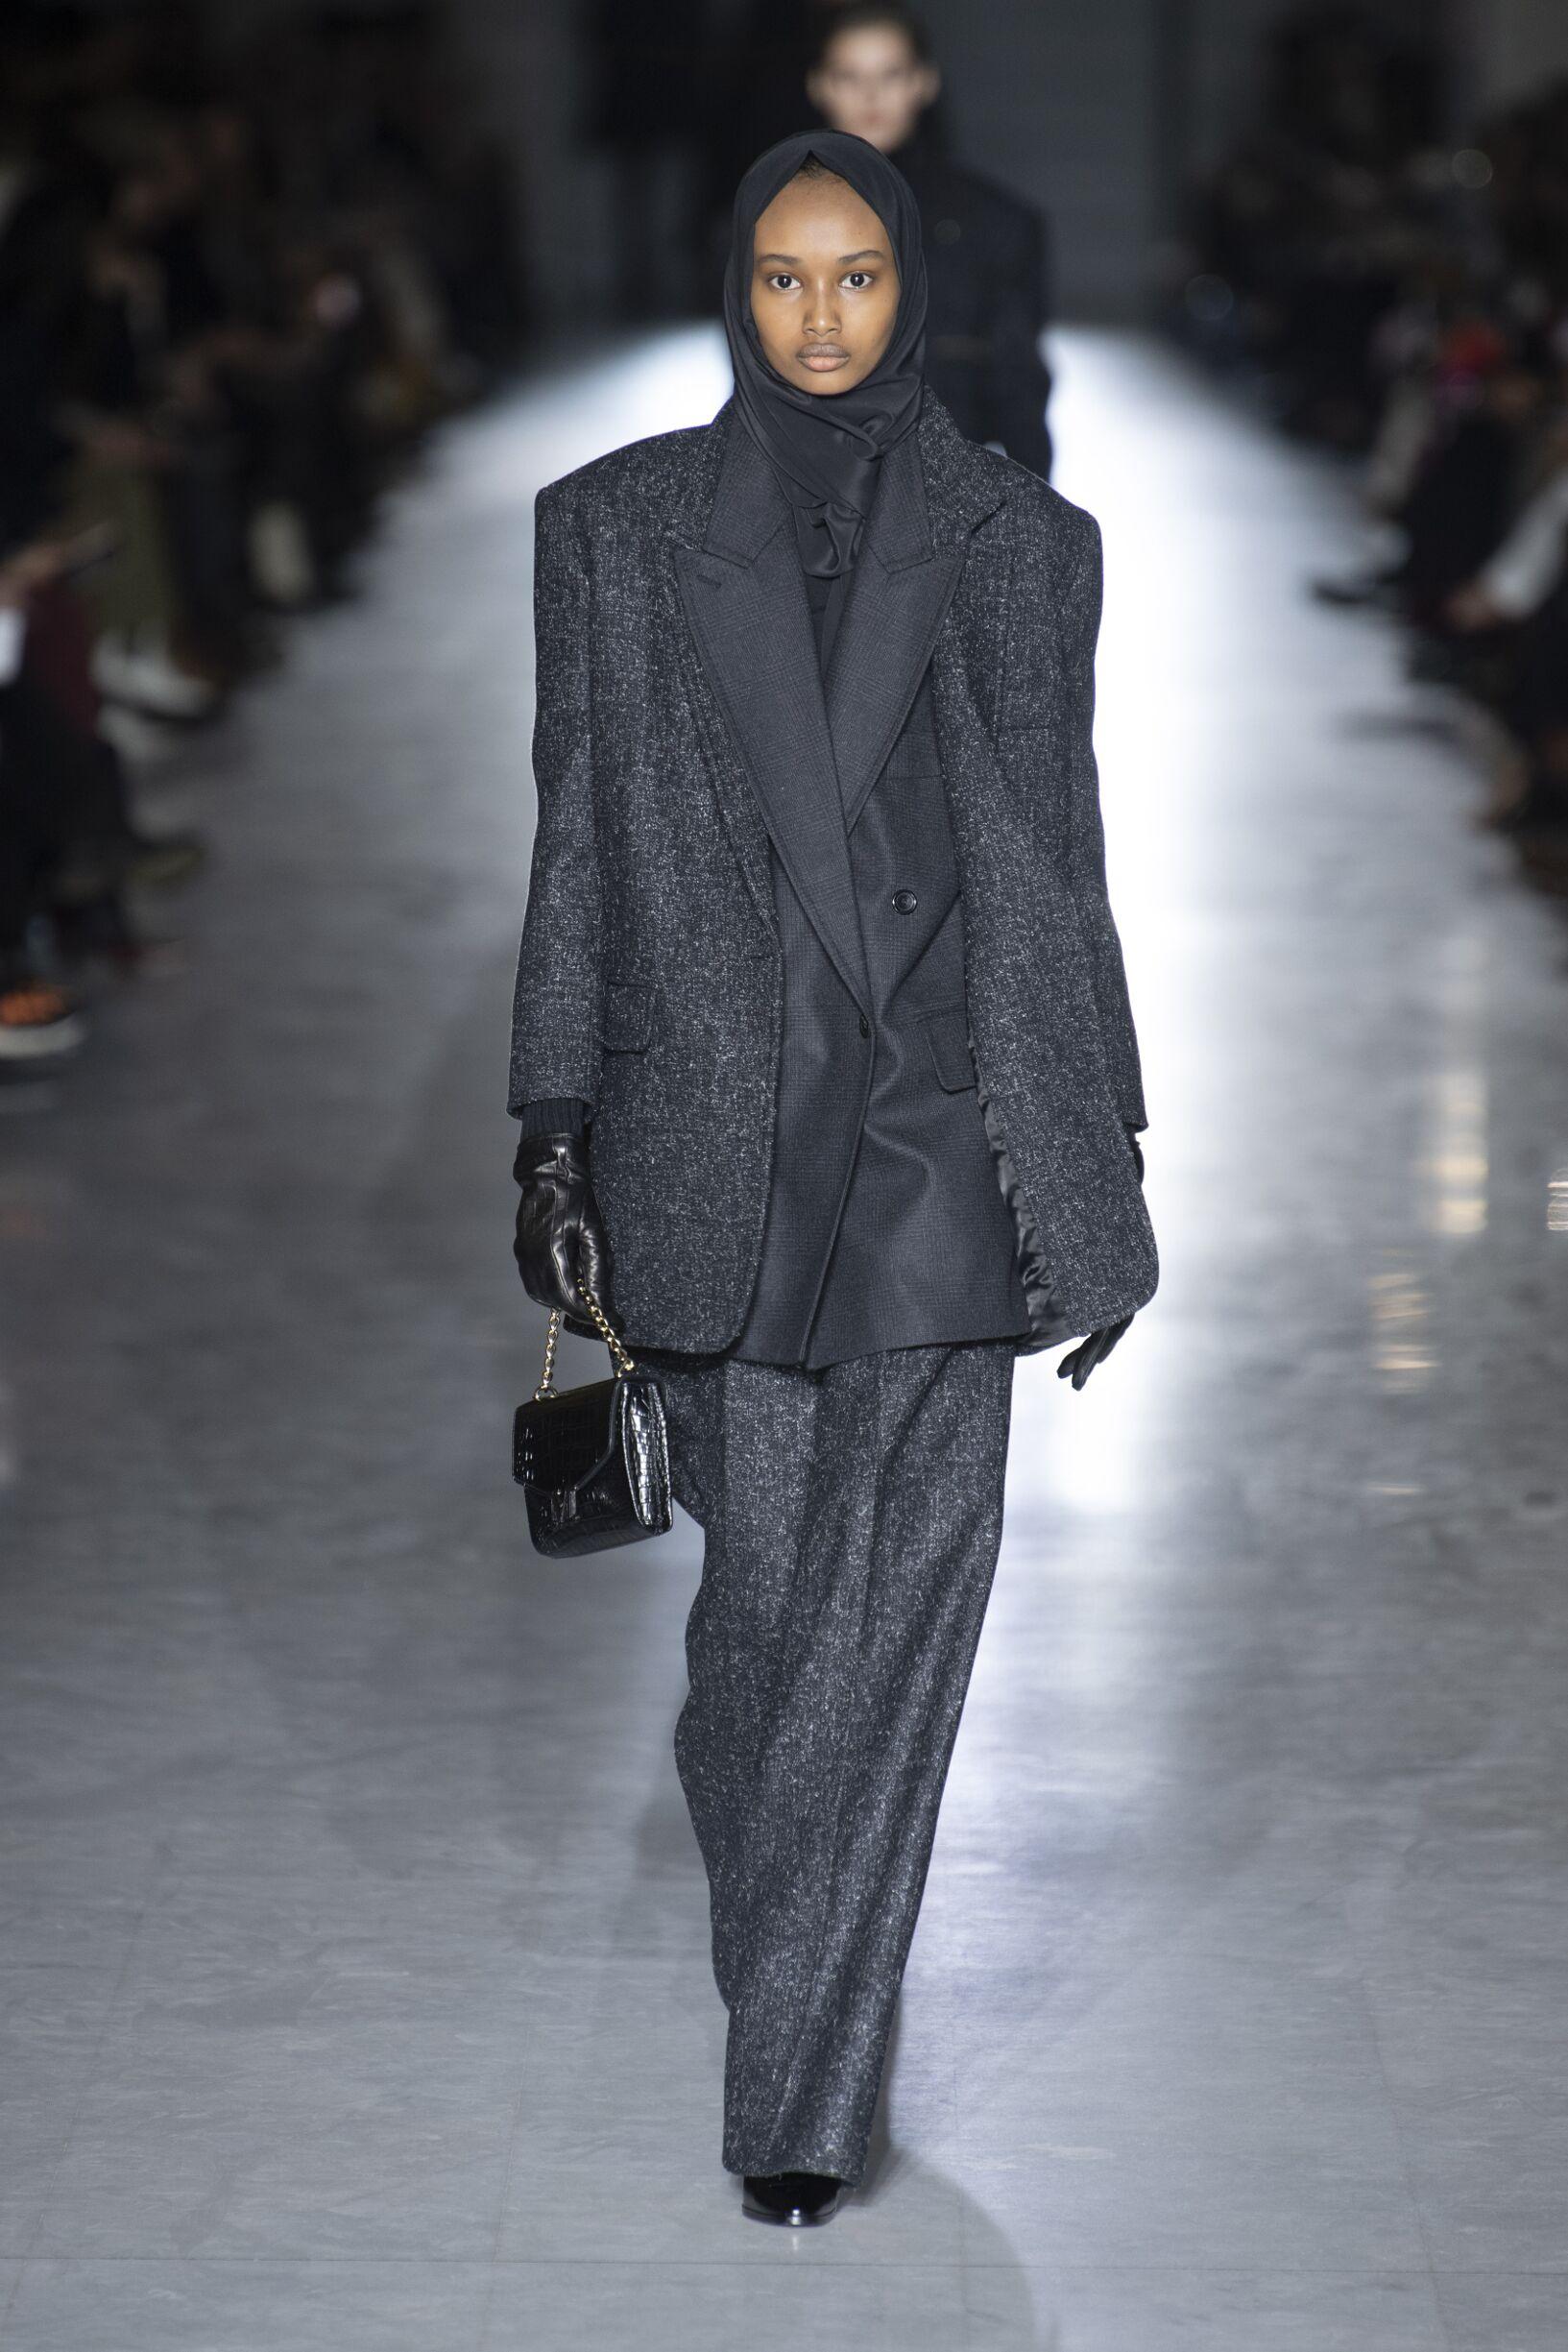 2019 Catwalk Max Mara Woman Fashion Show Winter